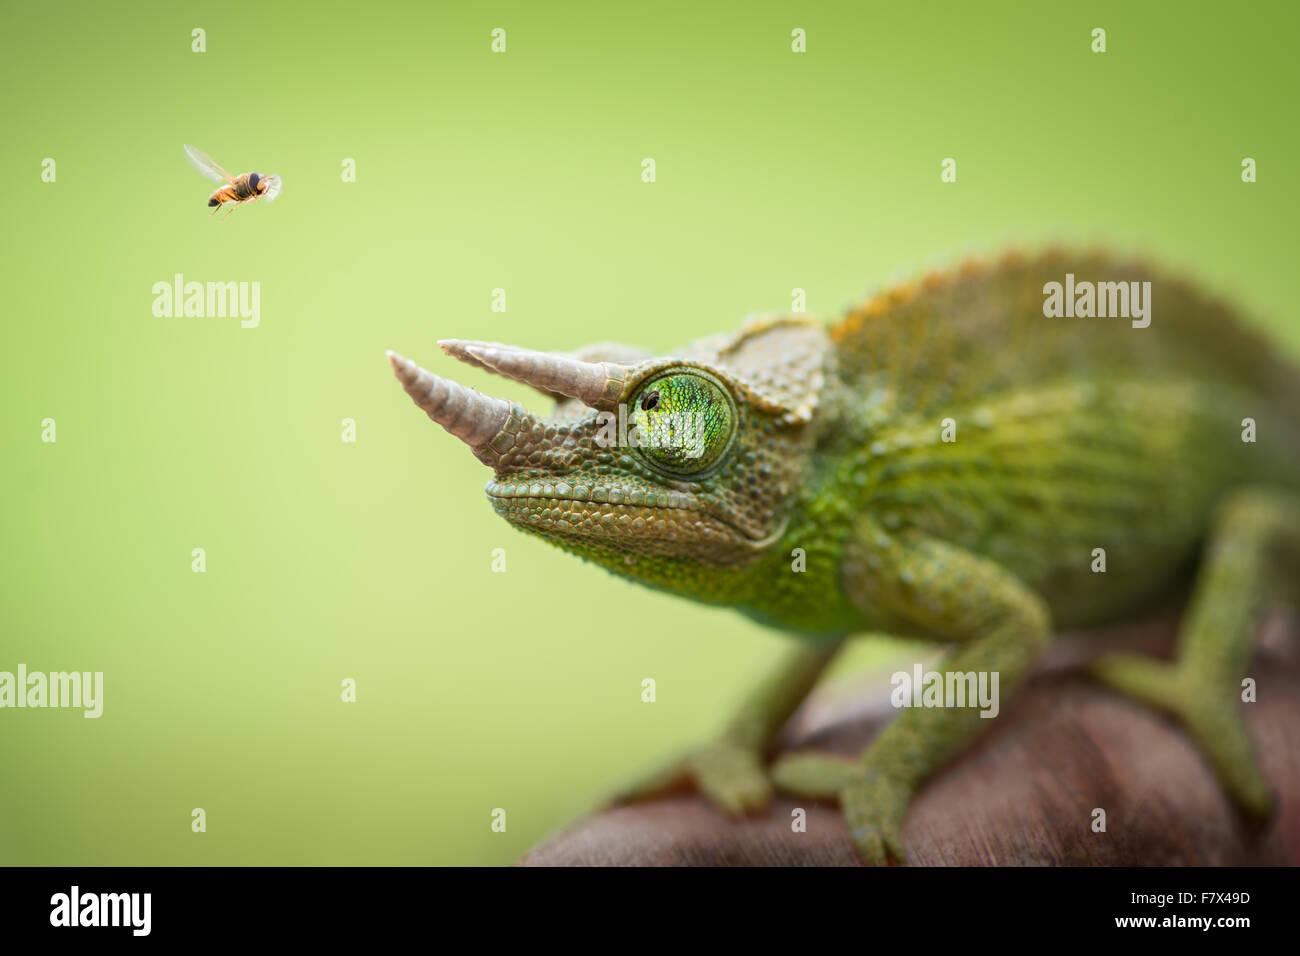 Hoverfly flying past a Jackson's chameleon (trioceros jacksonii) Stock Photo